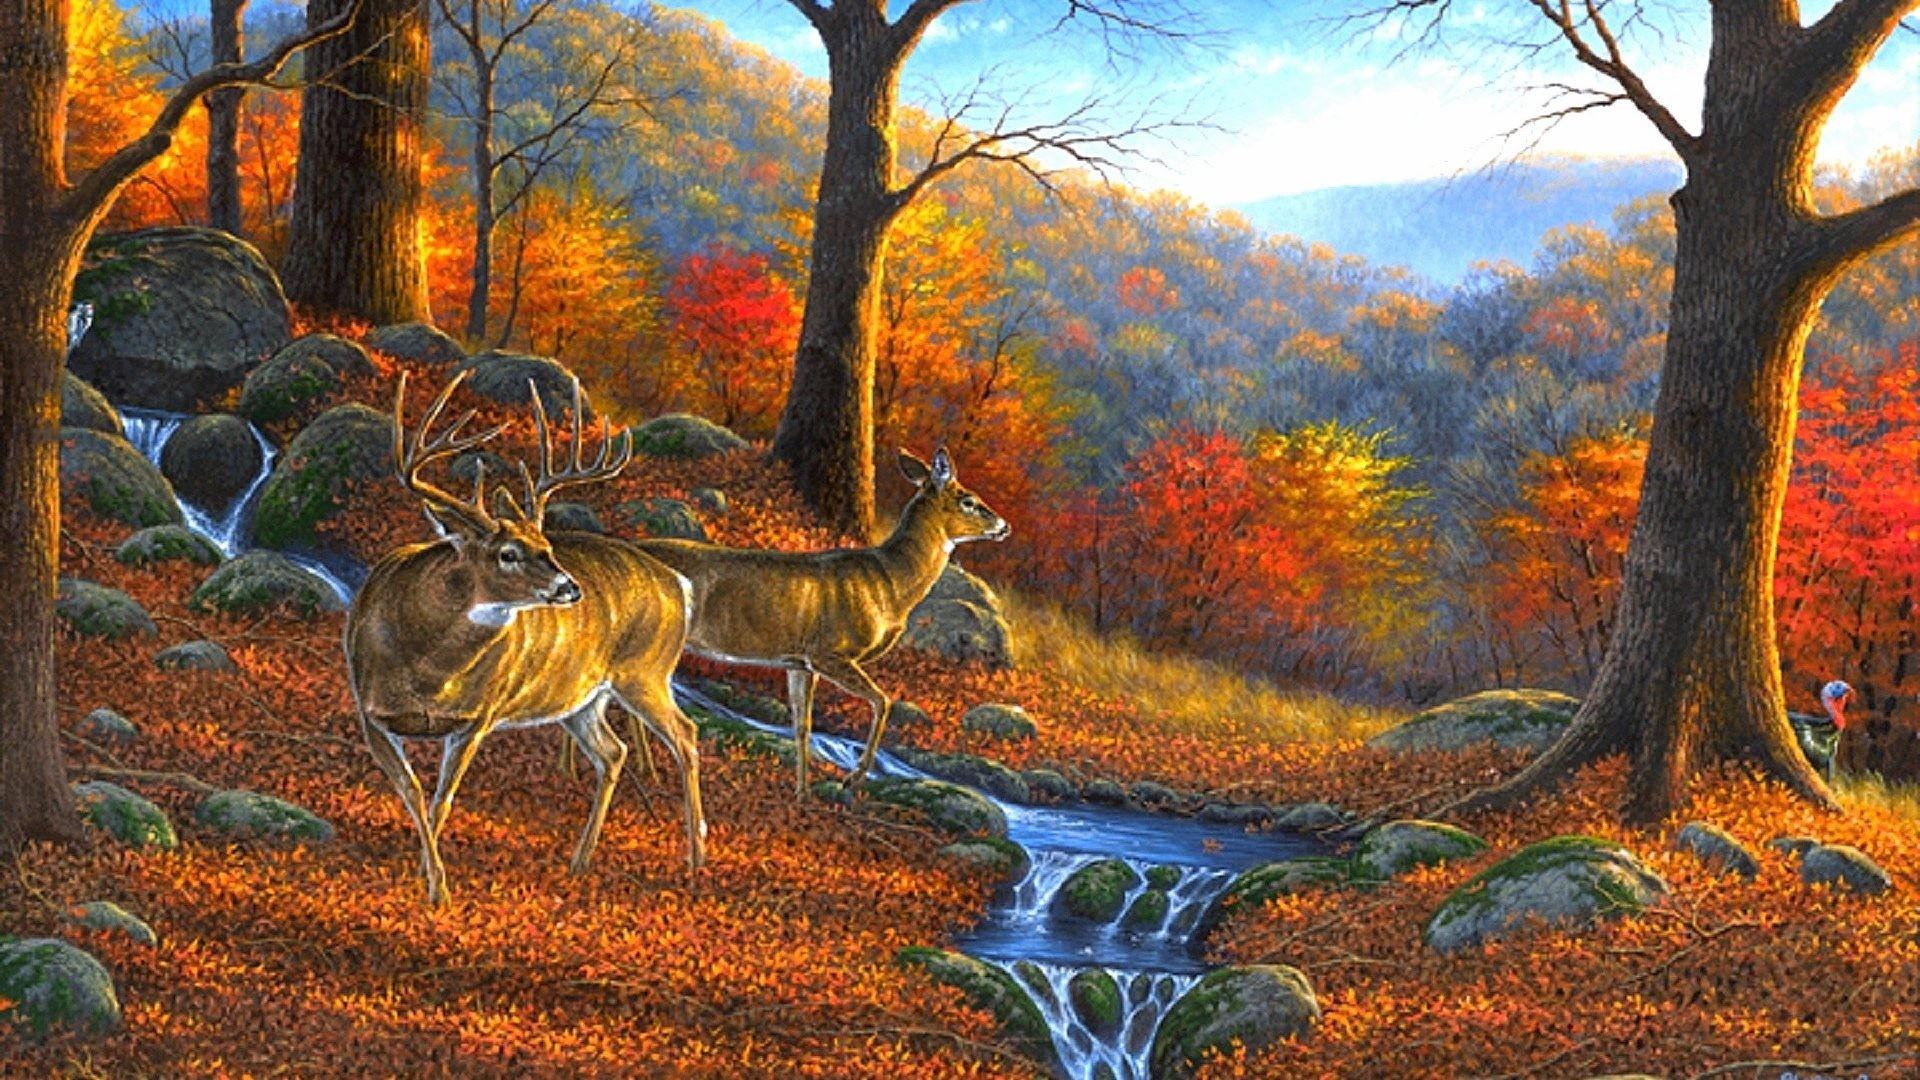 Ridge Tag – Autumn Season Lovely Seasons Creative Wildlife Animals Hunter  Trees Leaves Paintings Four Ridge